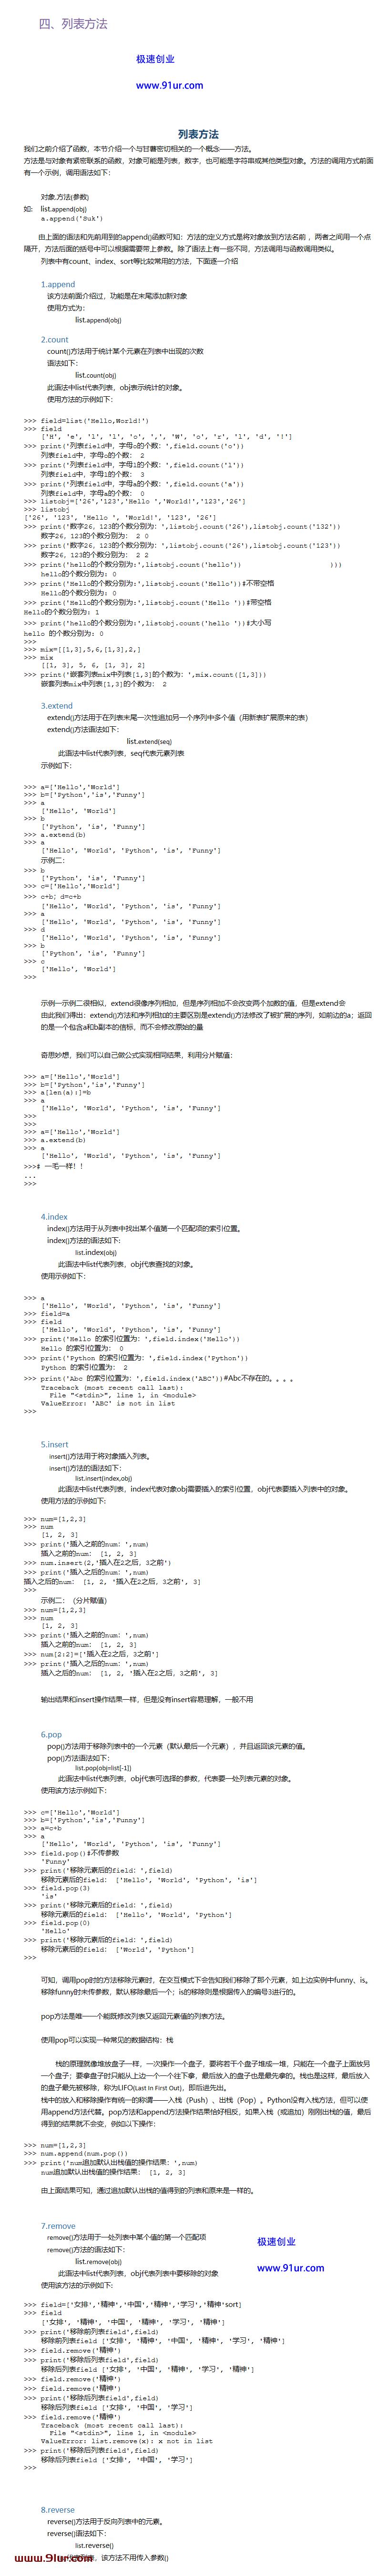 Python编程学习#Python基础笔记,从入门到入土到上手